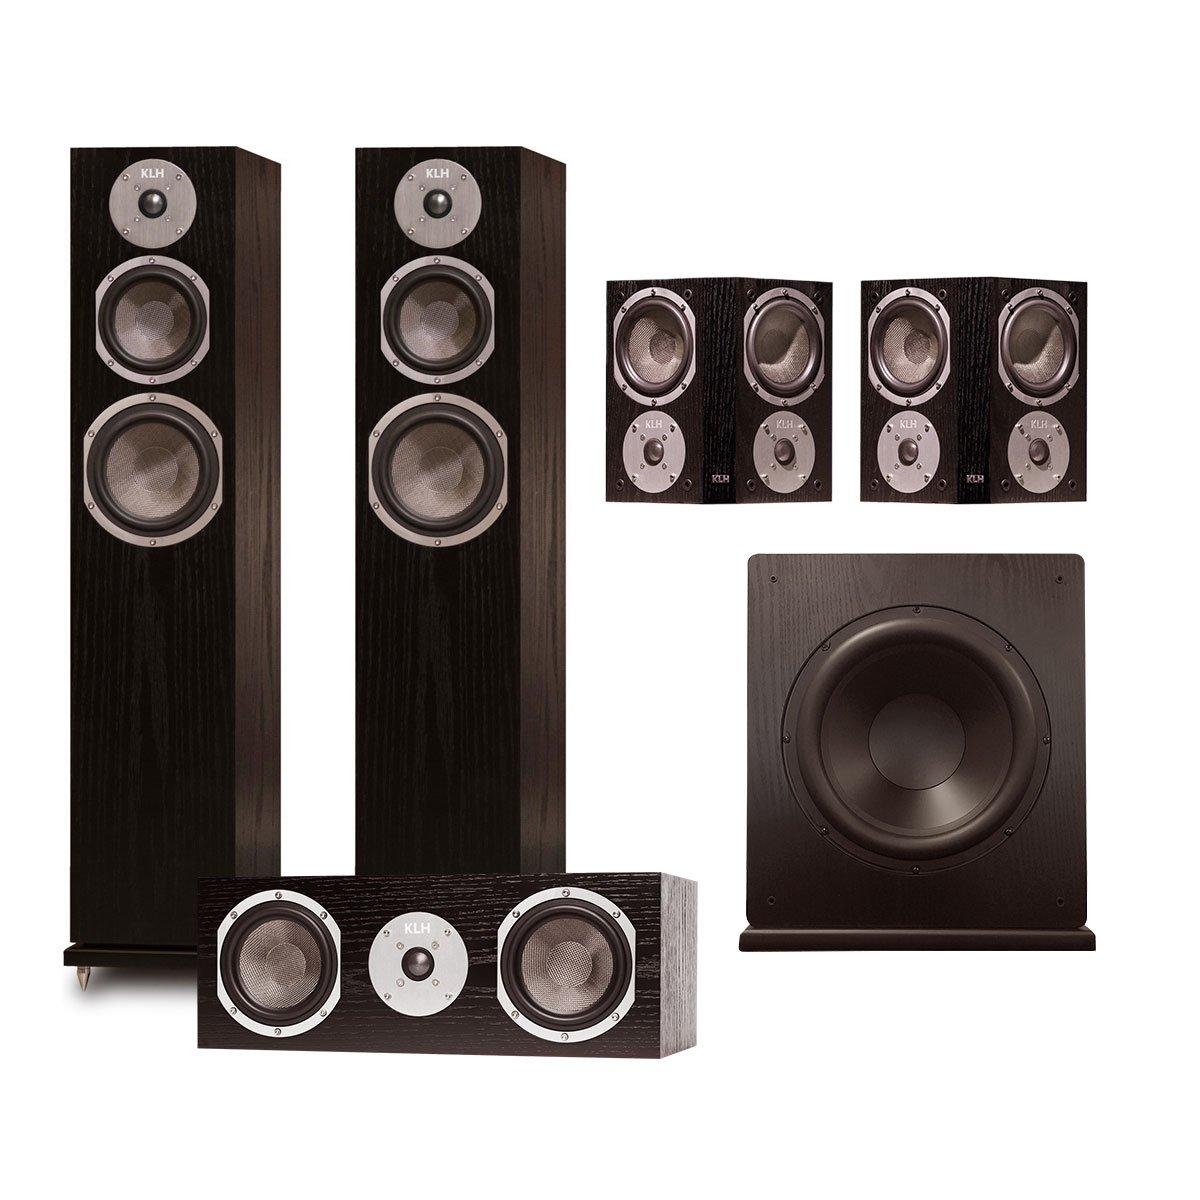 KLH Quincy 5.1 Speaker System (Black Oak)